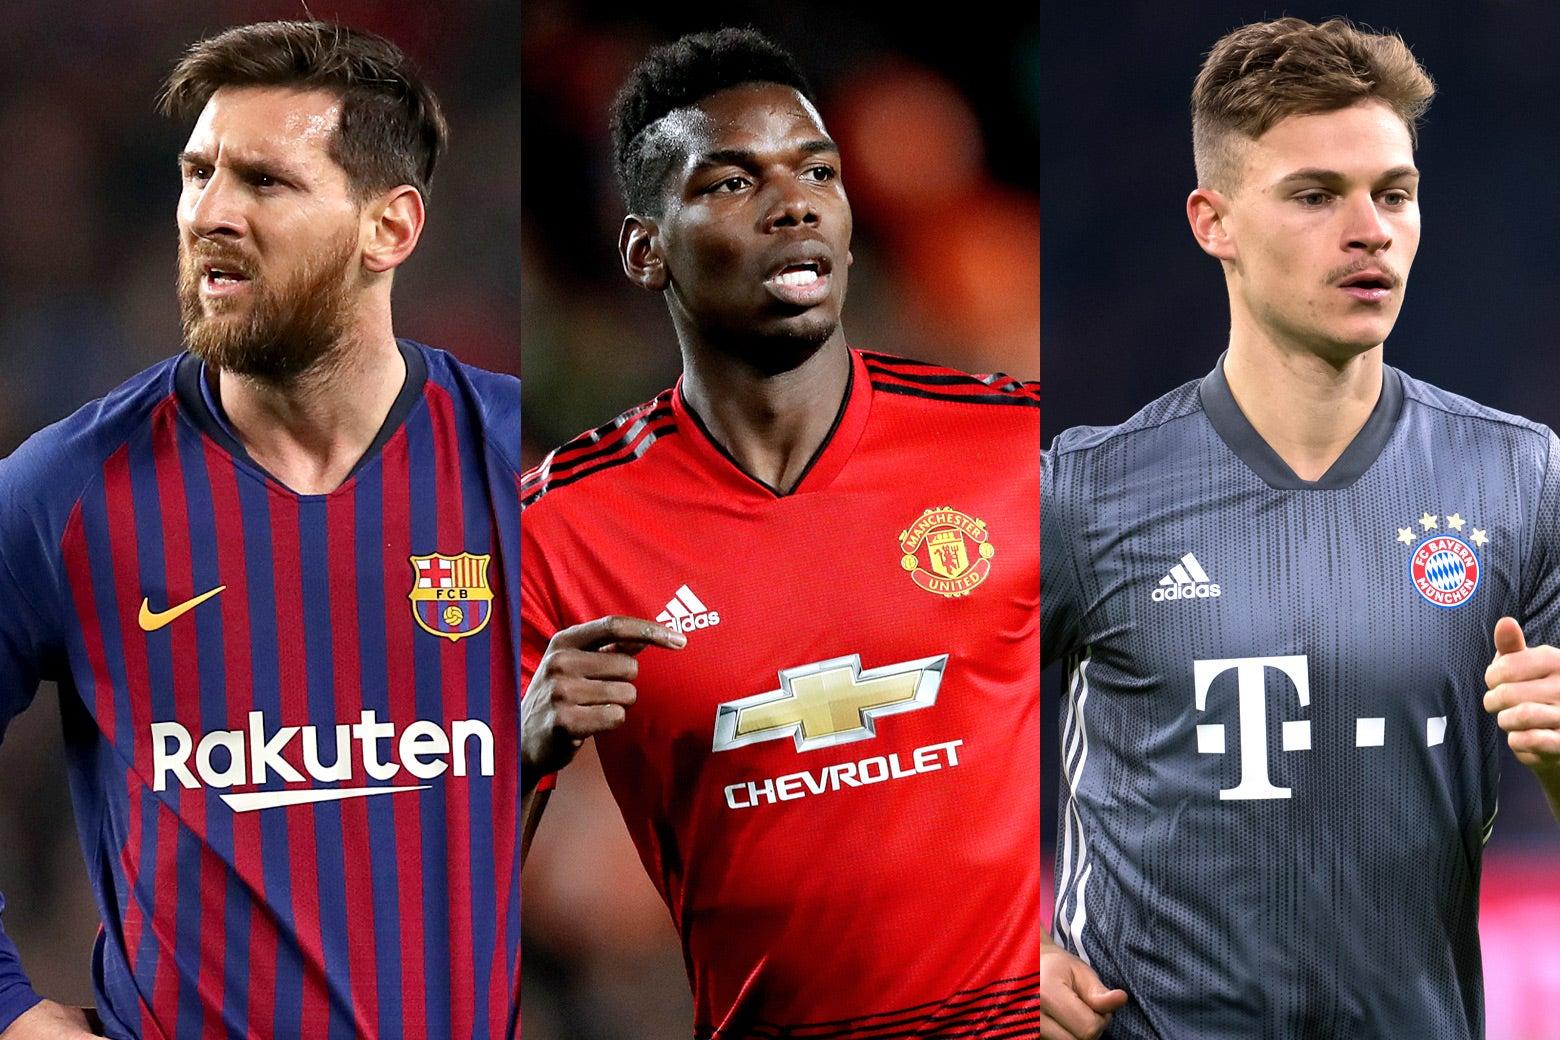 Lionel Messi of FC Barcelona, Paul Pogba of Manchester United, and Joshua Kimmich of Munich.